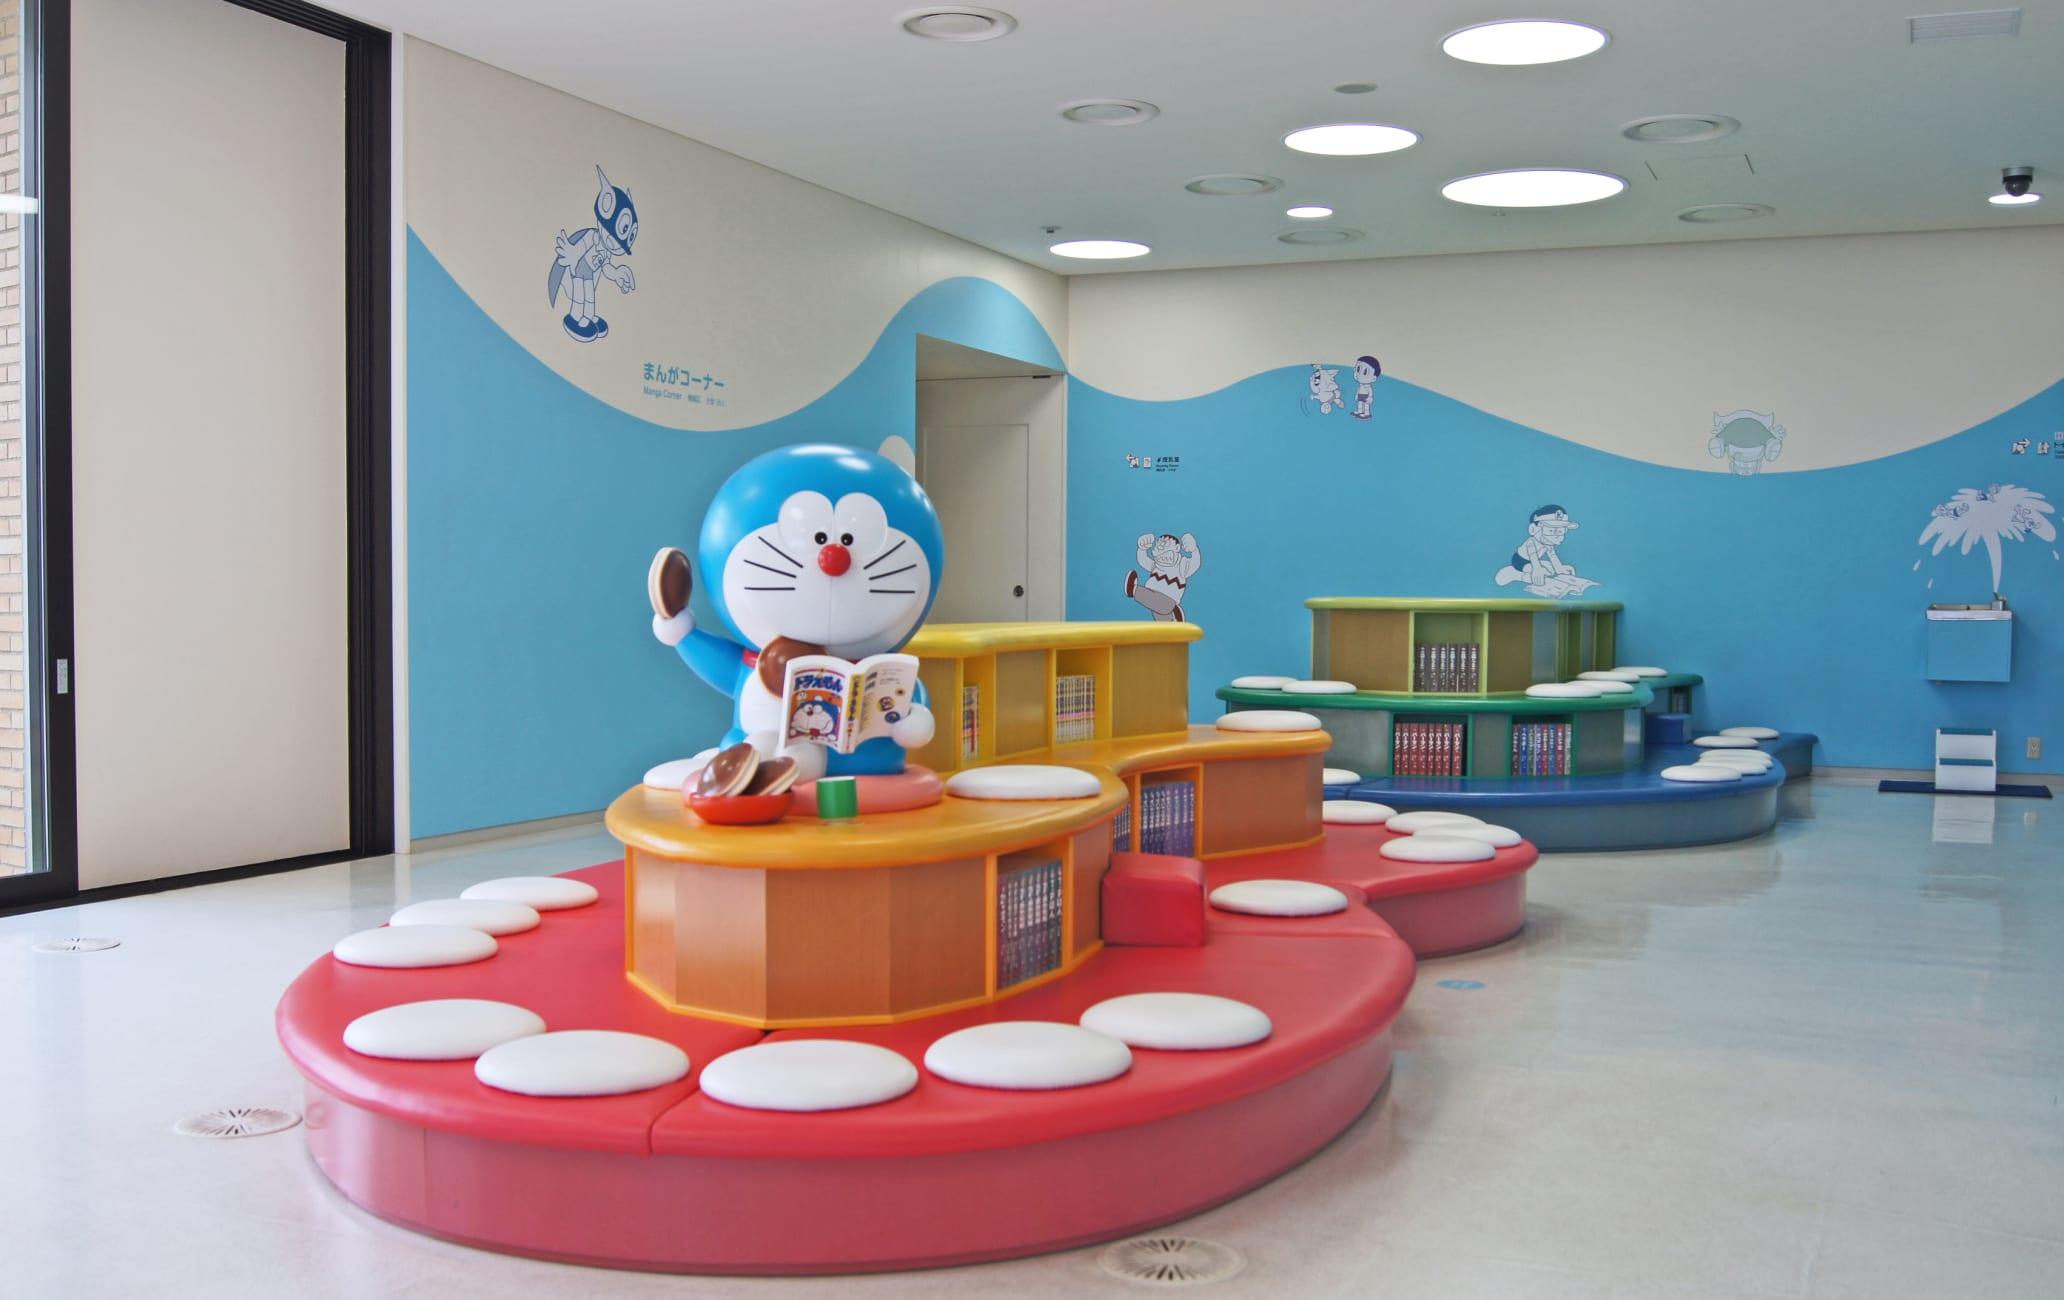 Fujiko F Fujio Museum